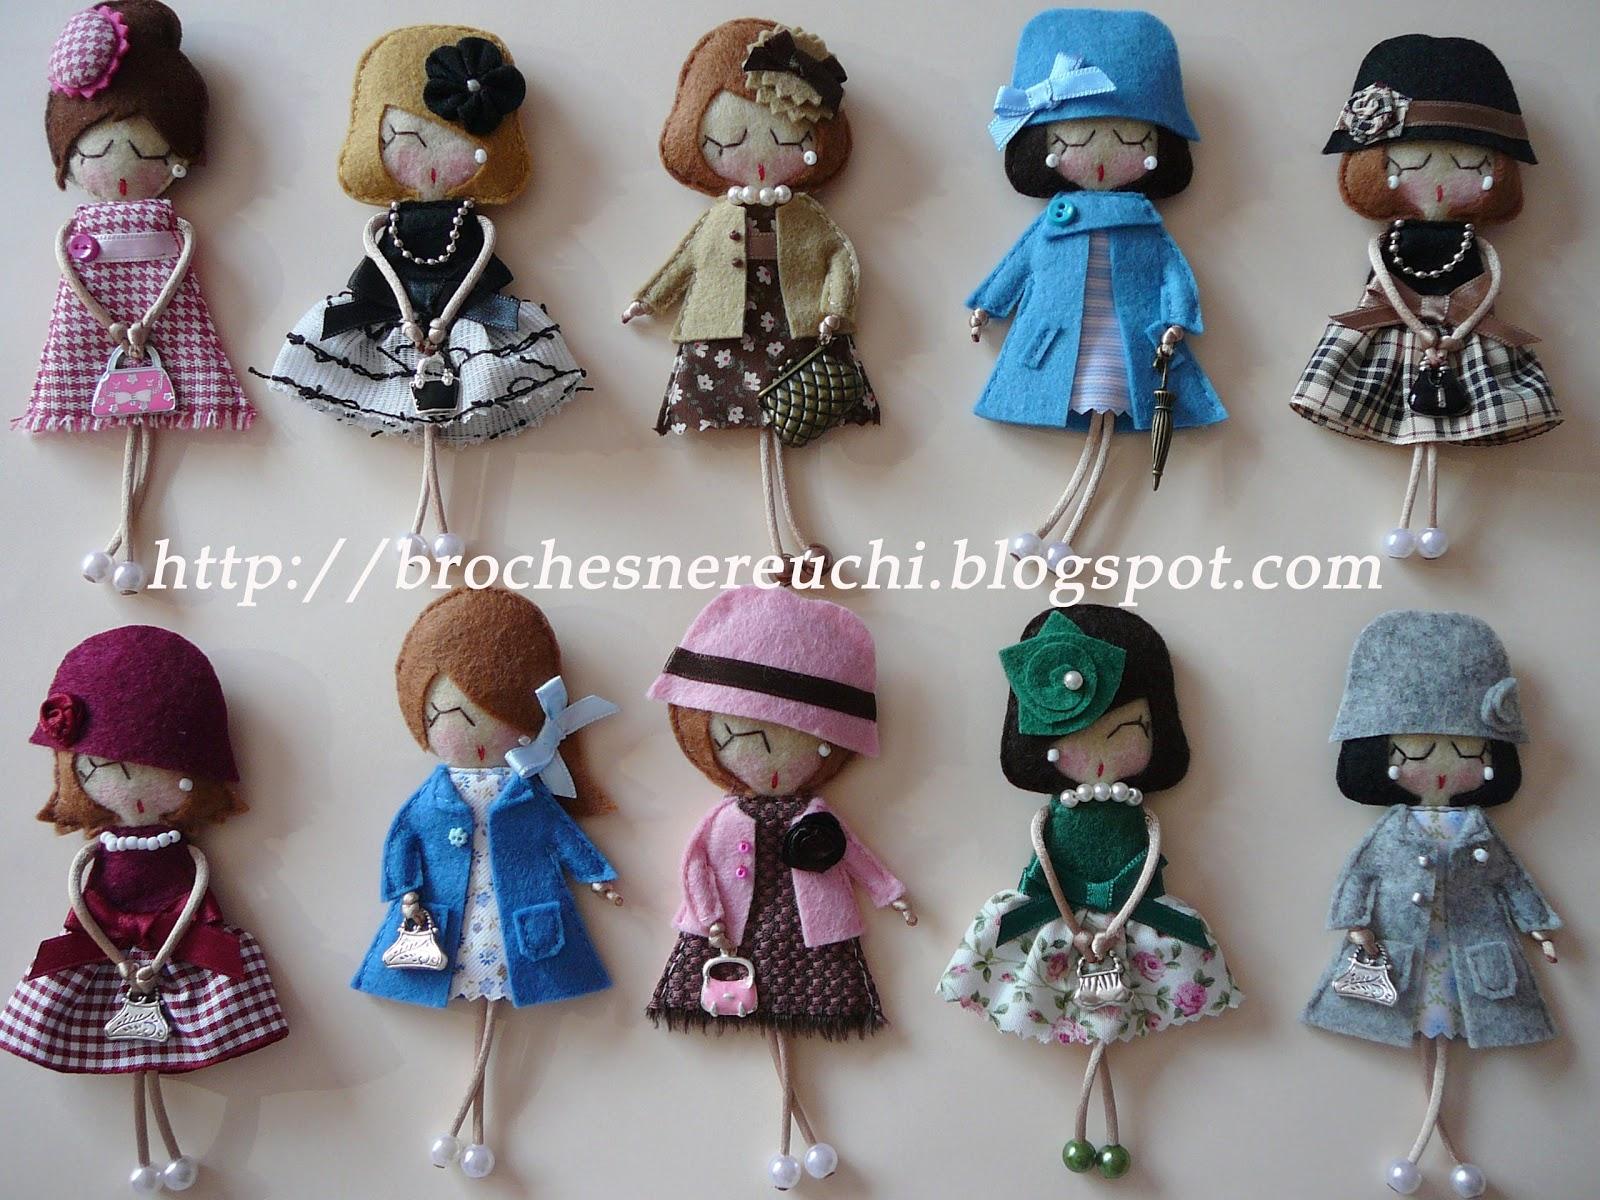 Игра в куколки шьём мягкие брошки из фетра Ярмарка 53